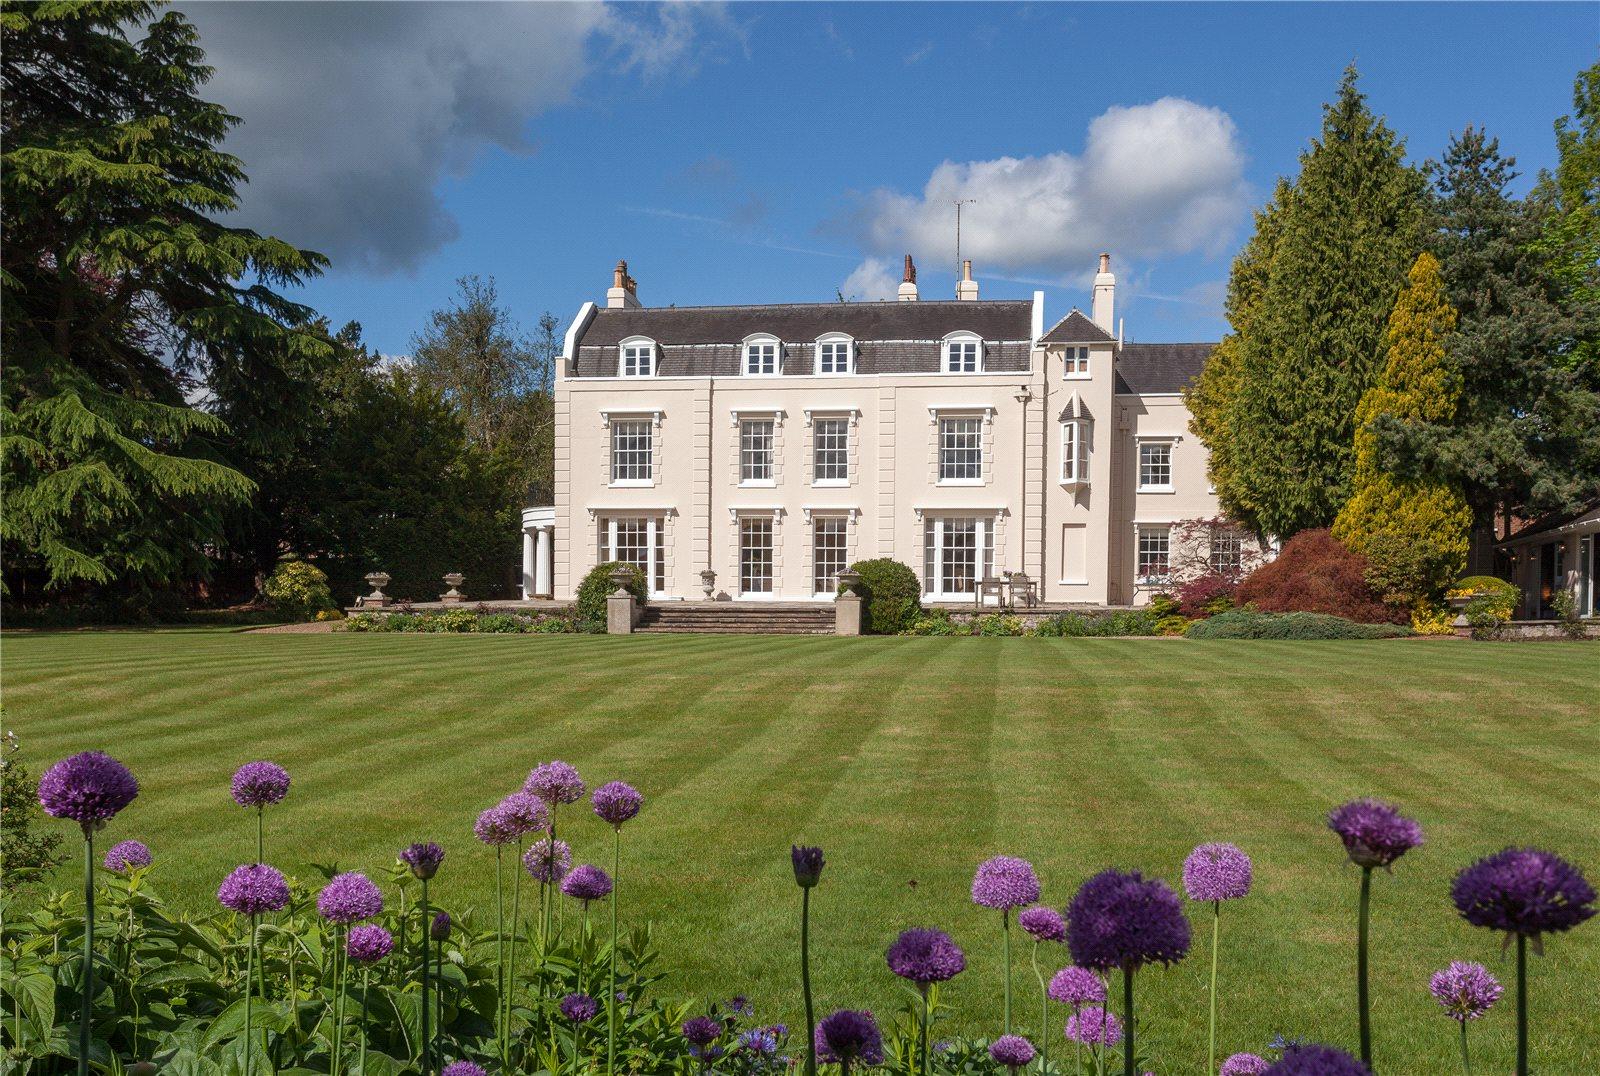 Maison unifamiliale pour l Vente à Hadham Cross (Lot 1), Much Hadham, Hertfordshire, SG10 Much Hadham, Angleterre